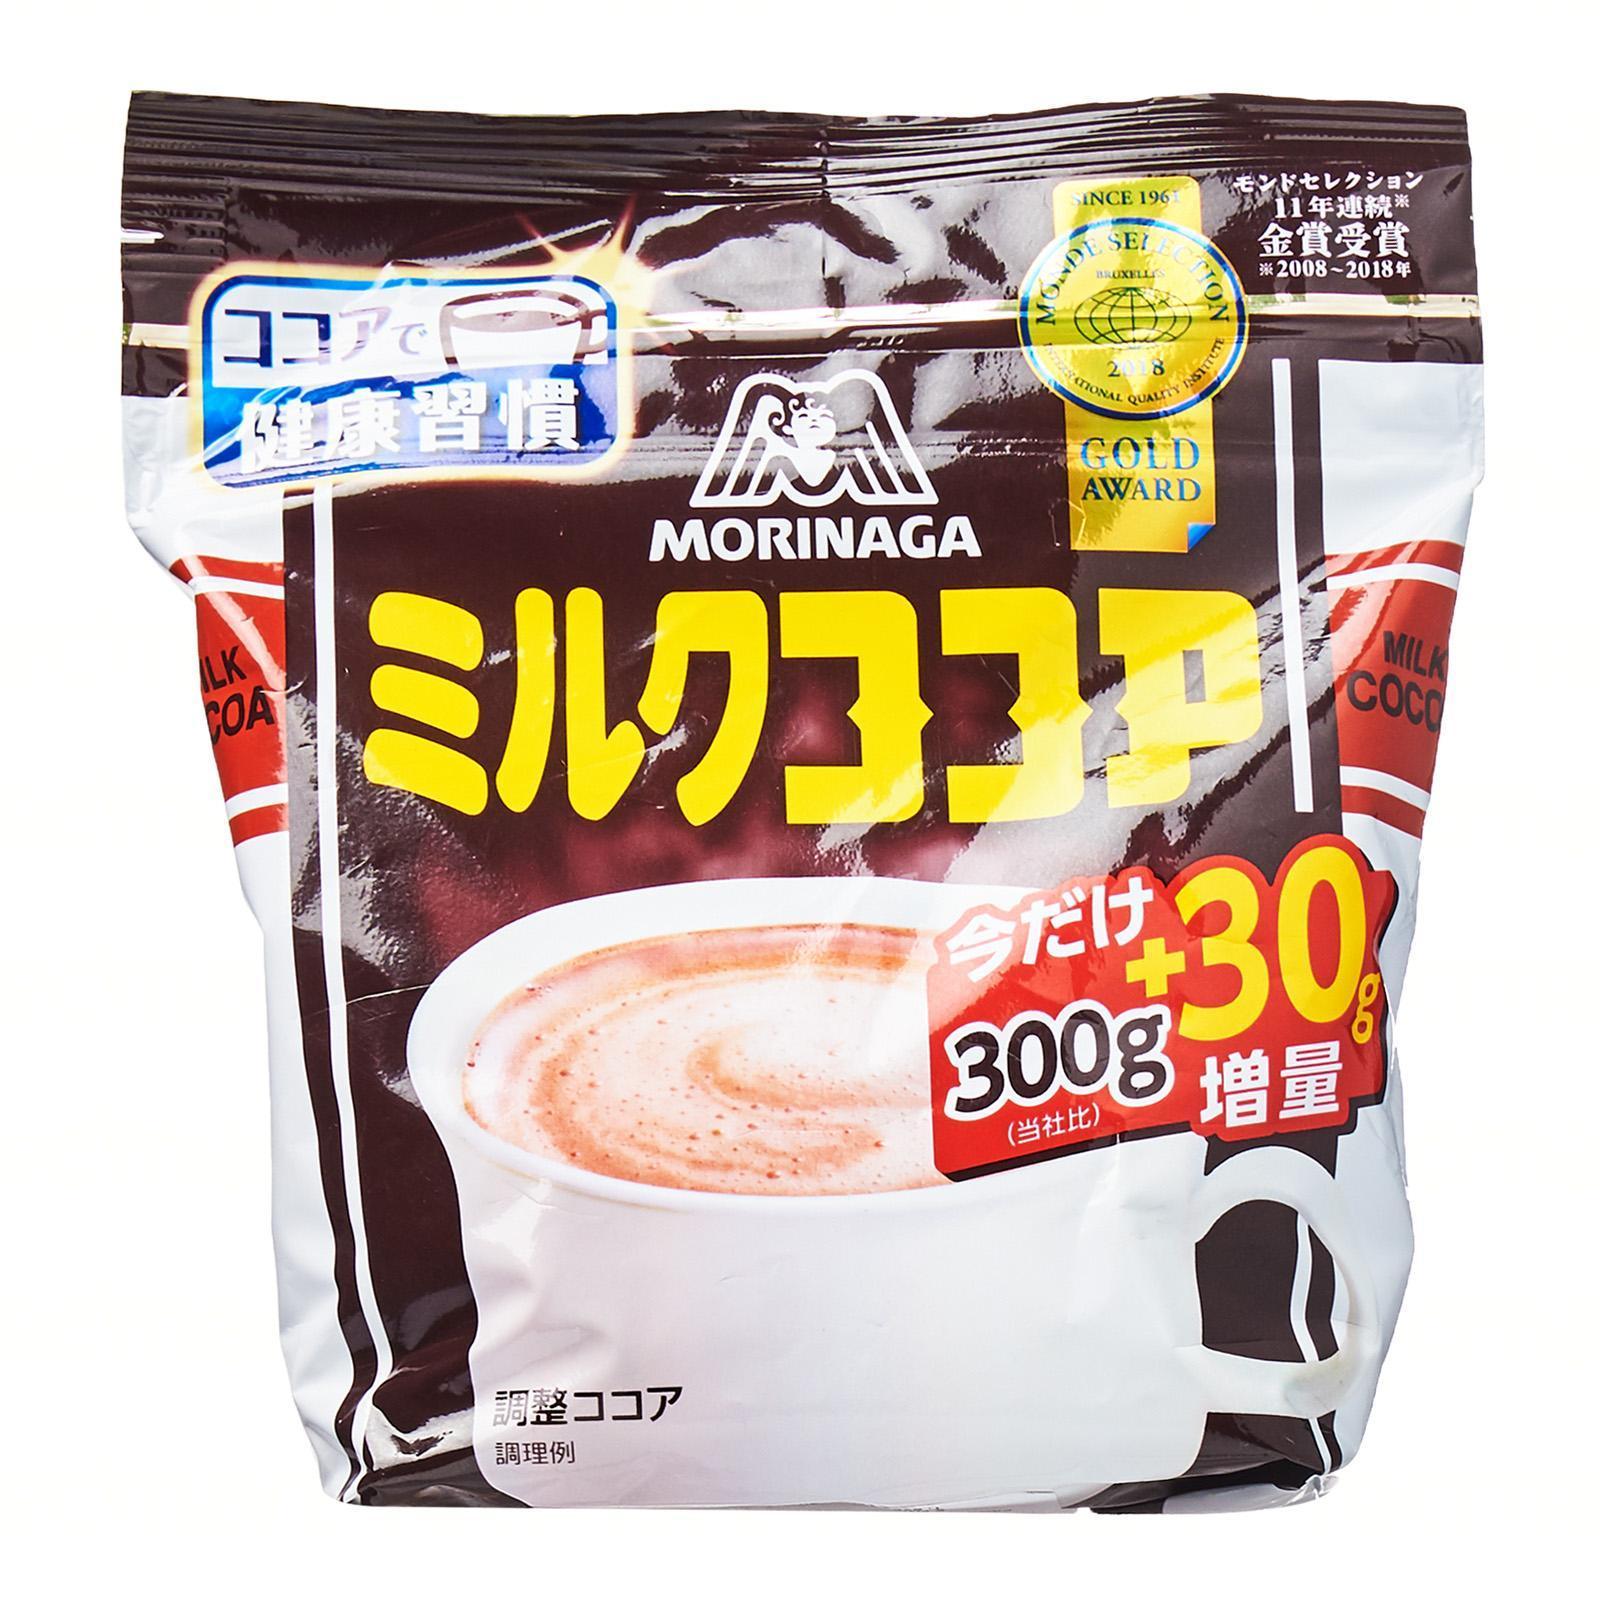 Morinaga Milk Cocoa Powder - Jetro Special